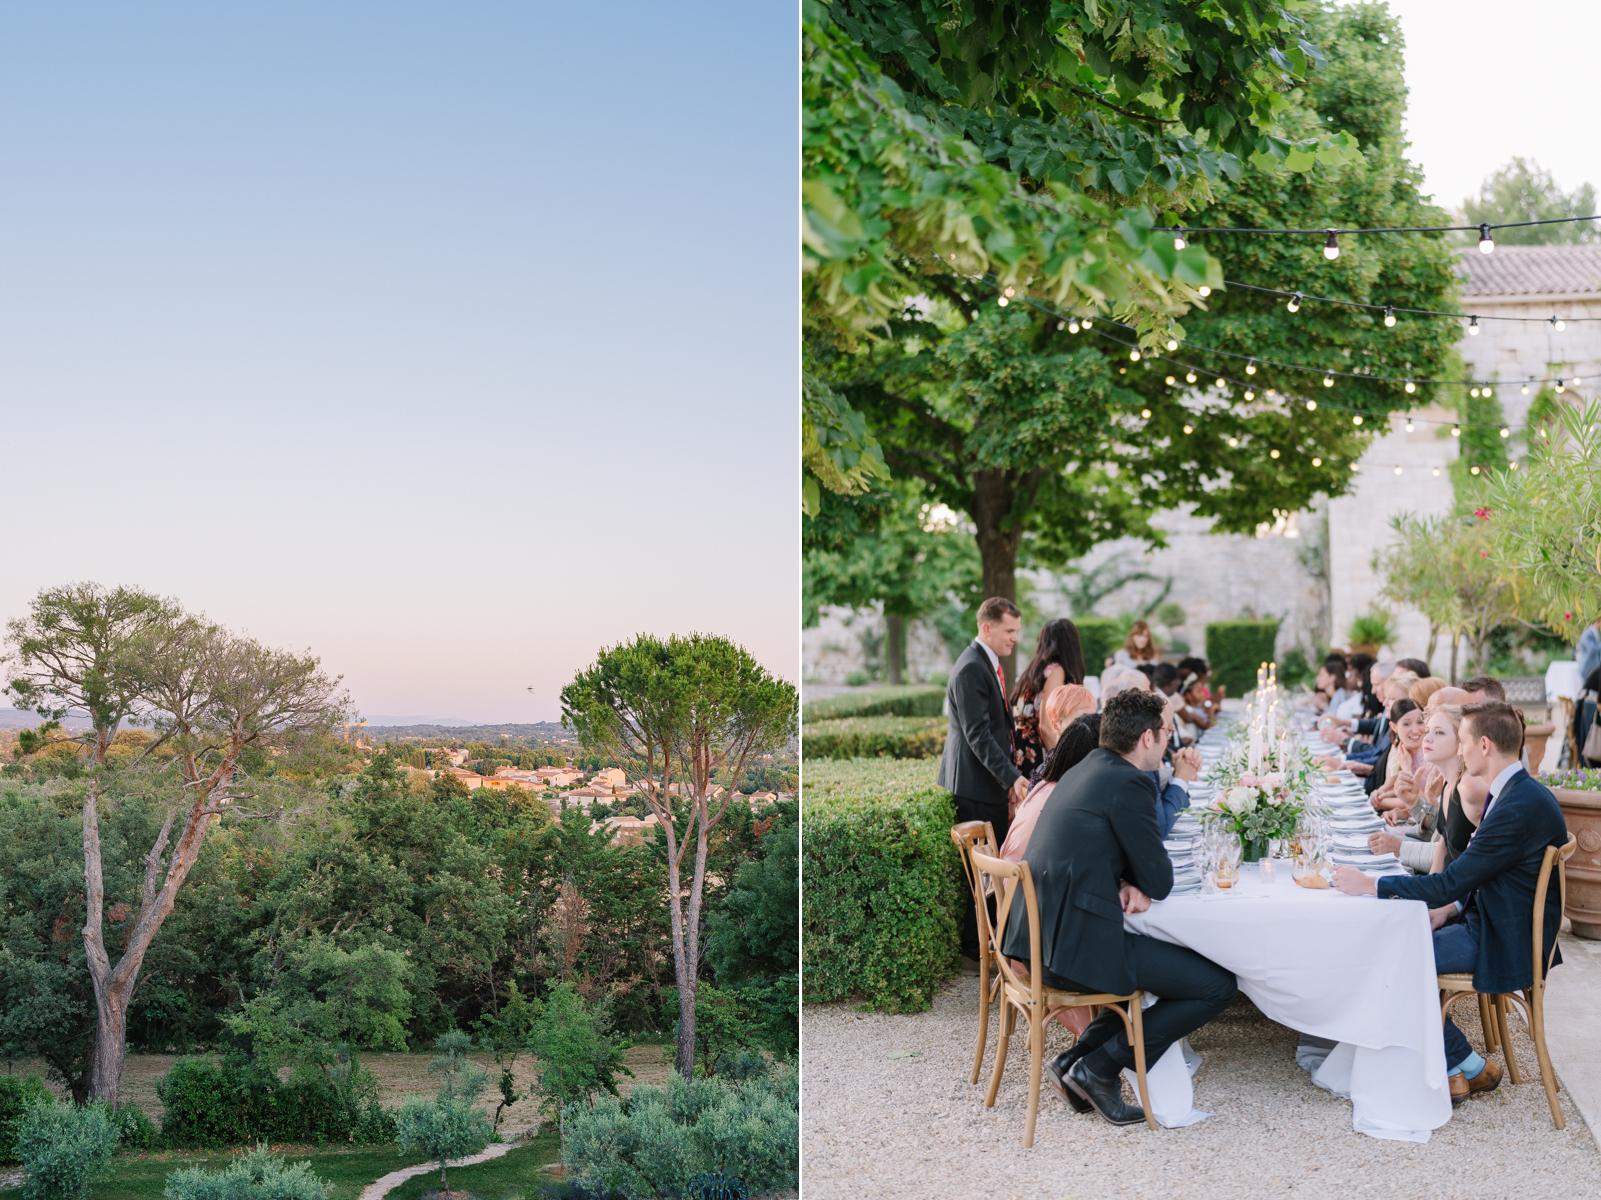 Boheme-Moon-Photography-Wedding-in-Provence-France_029.jpg